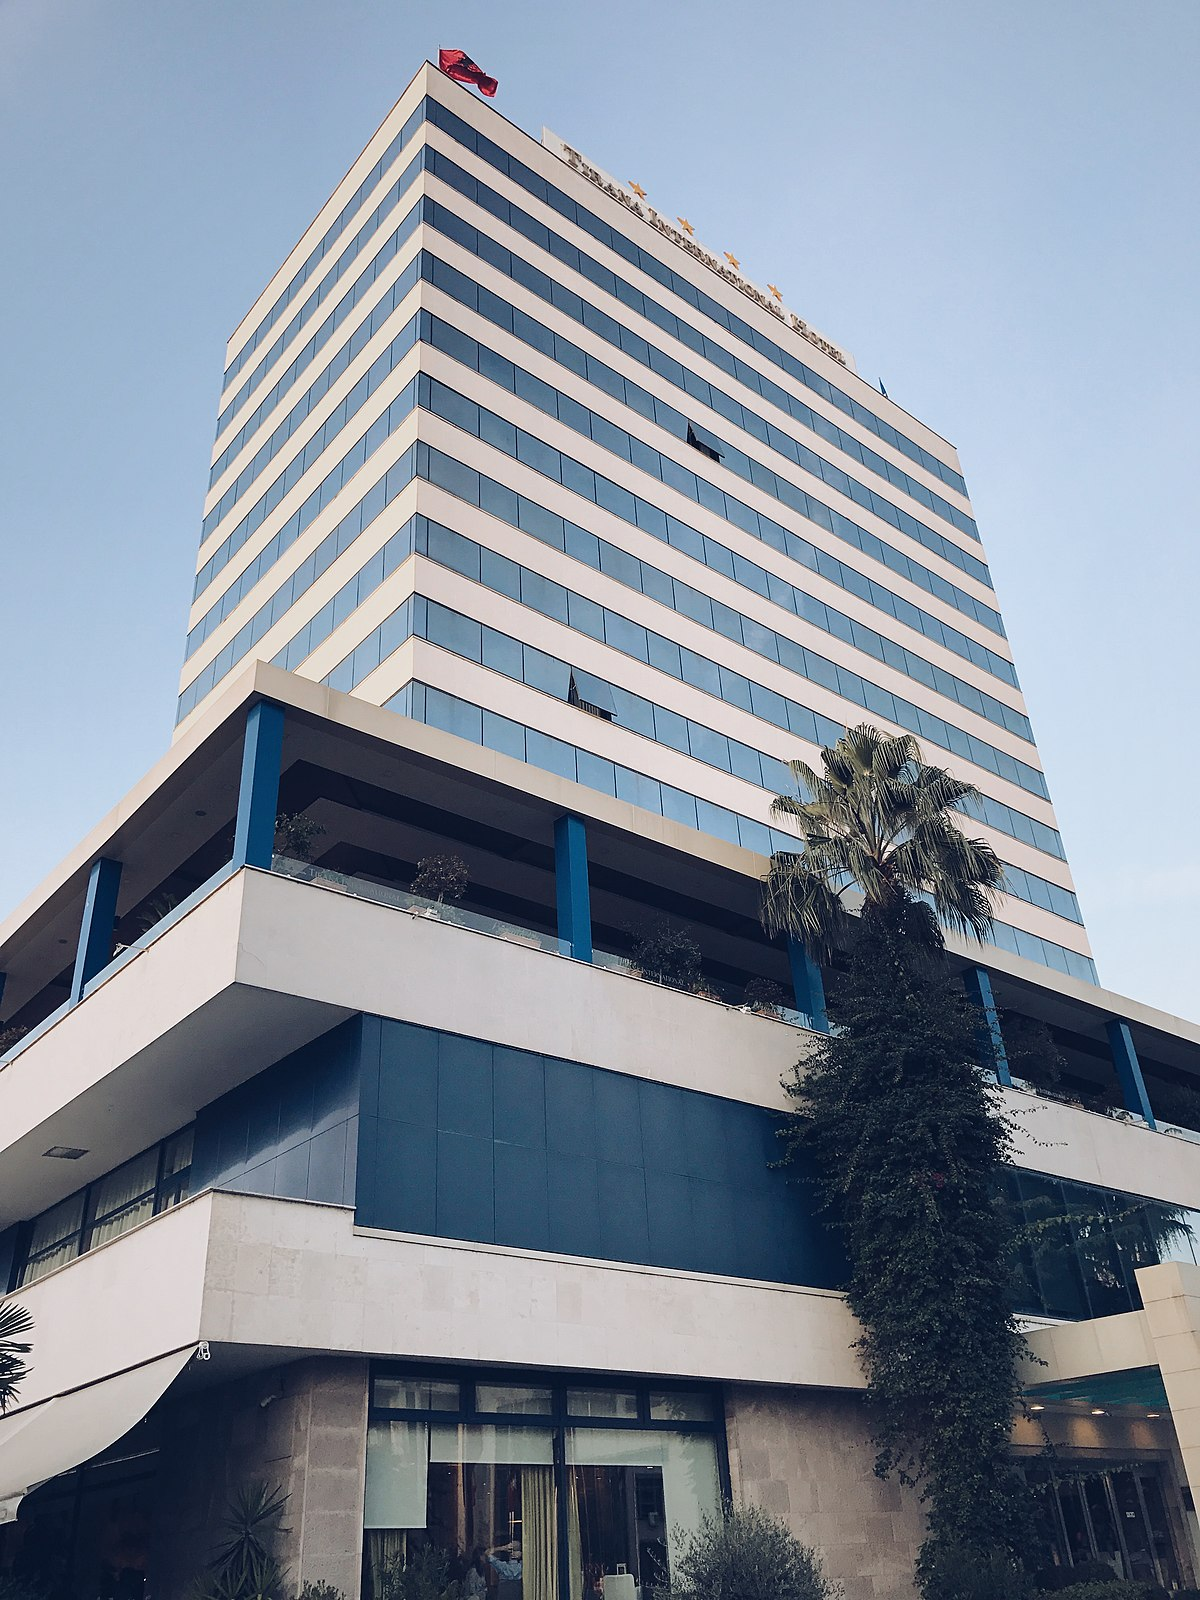 Tirana International Hotel Wikipedia